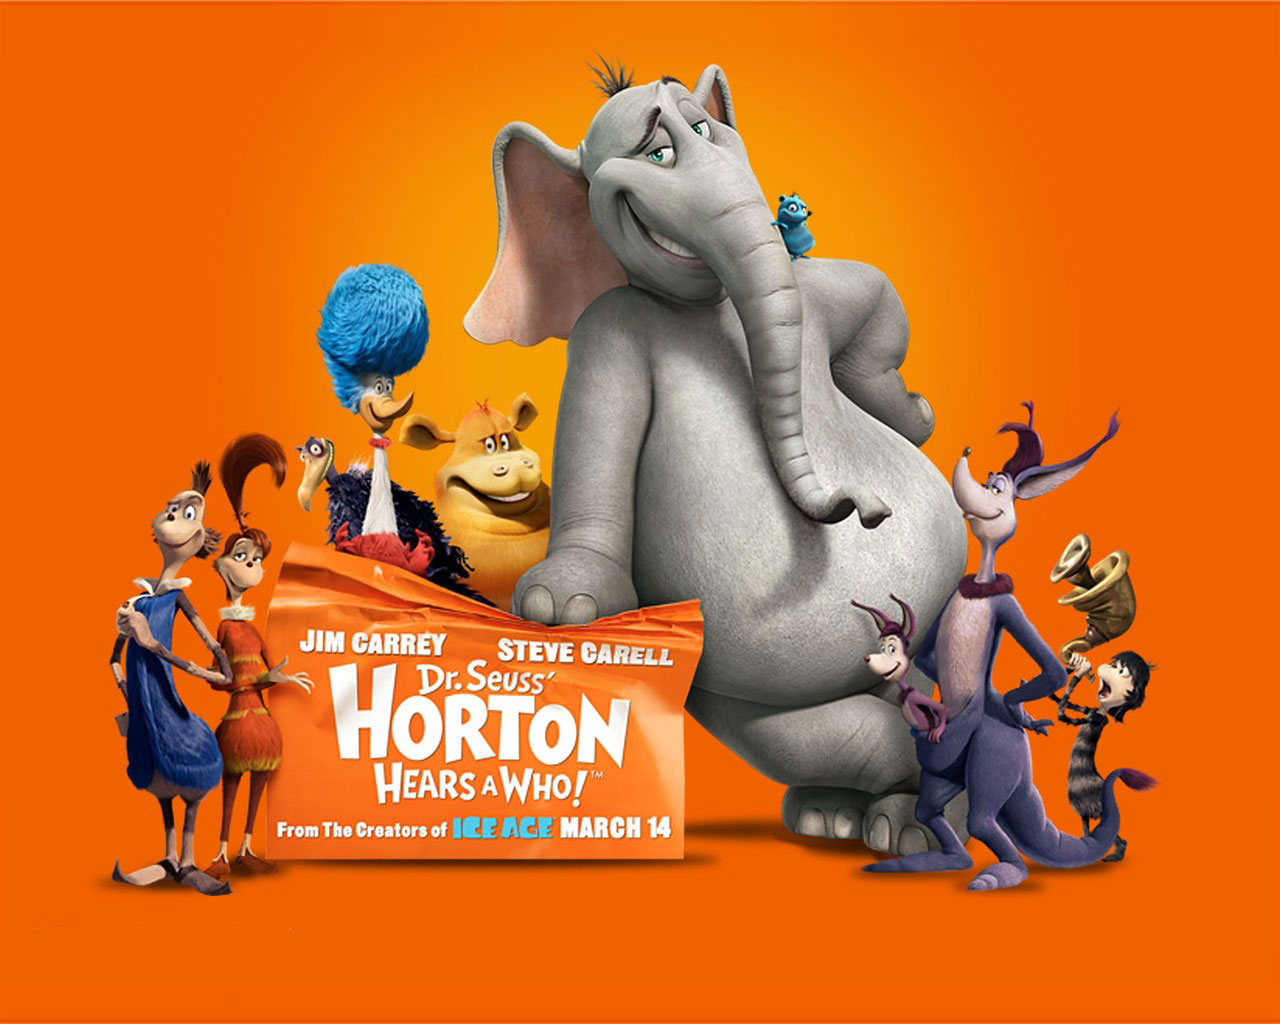 horton-hears-a-who-1396